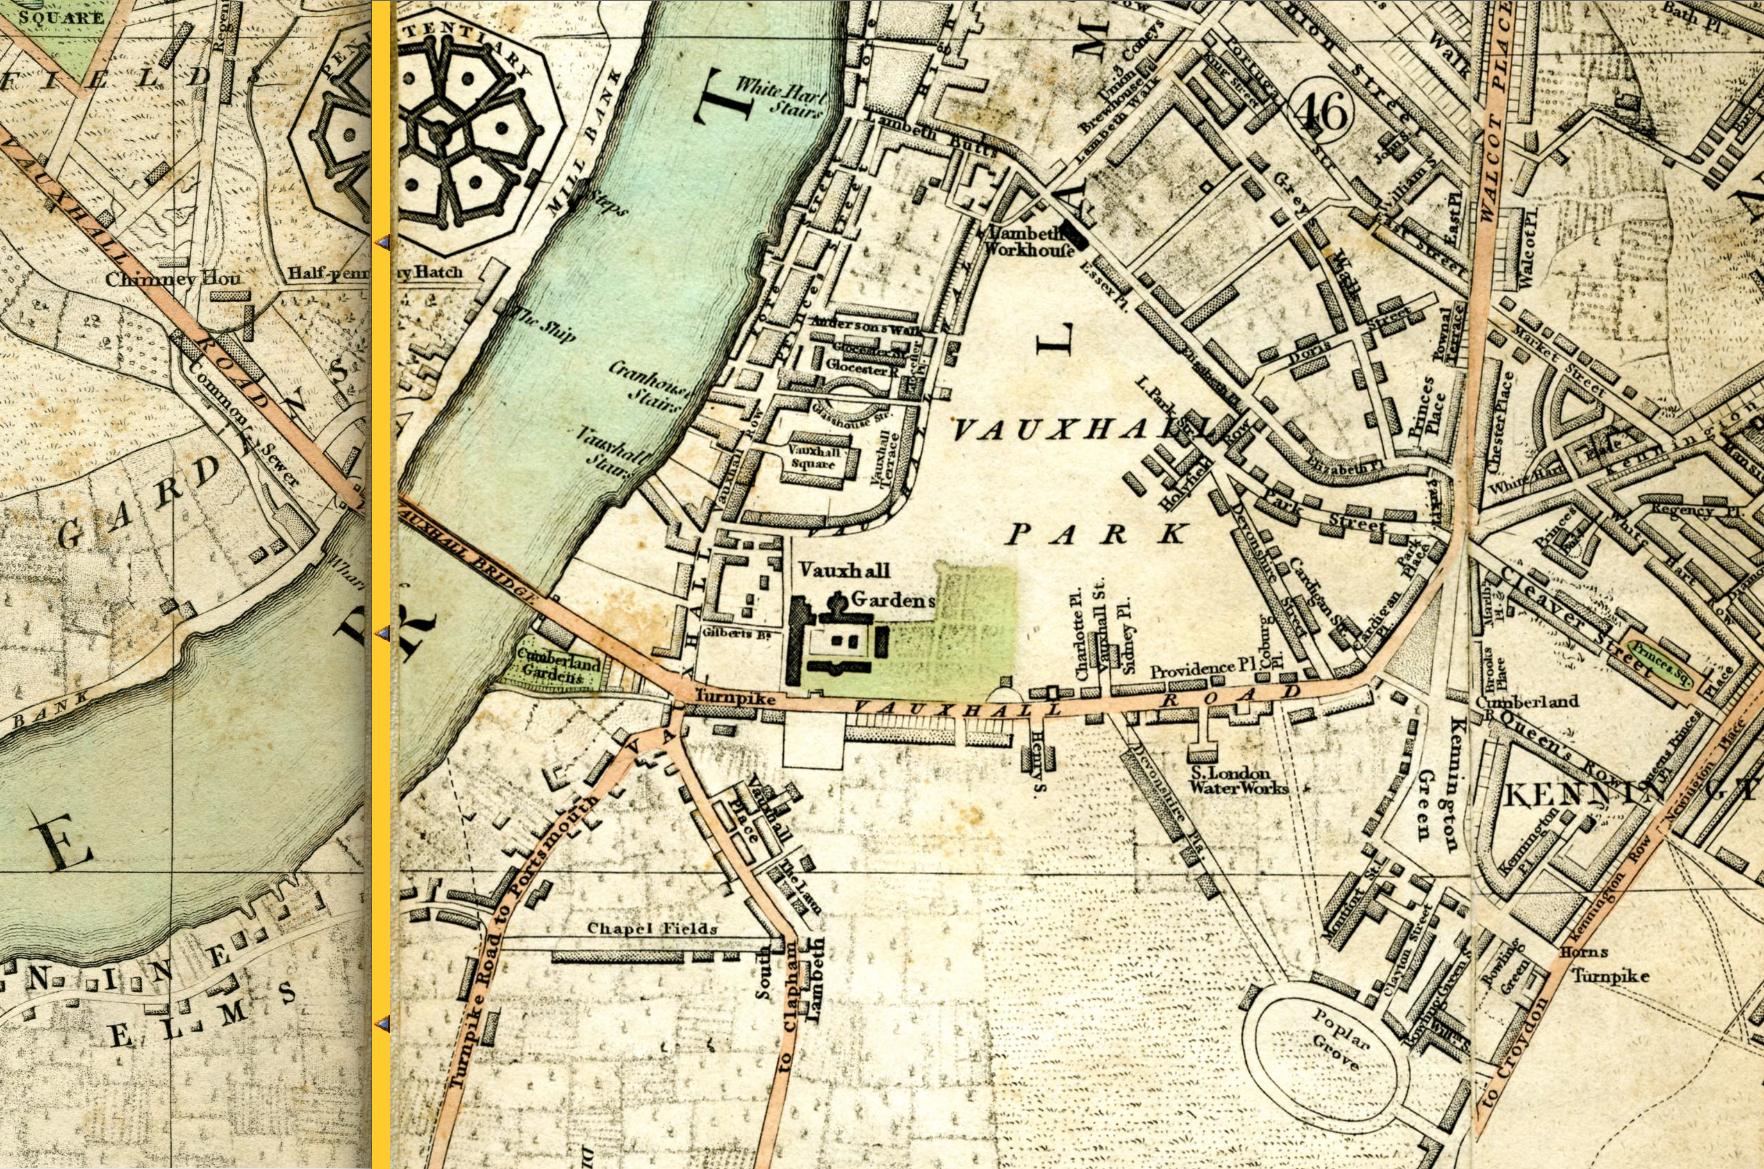 Vauxhall Kennington The Oval Maps